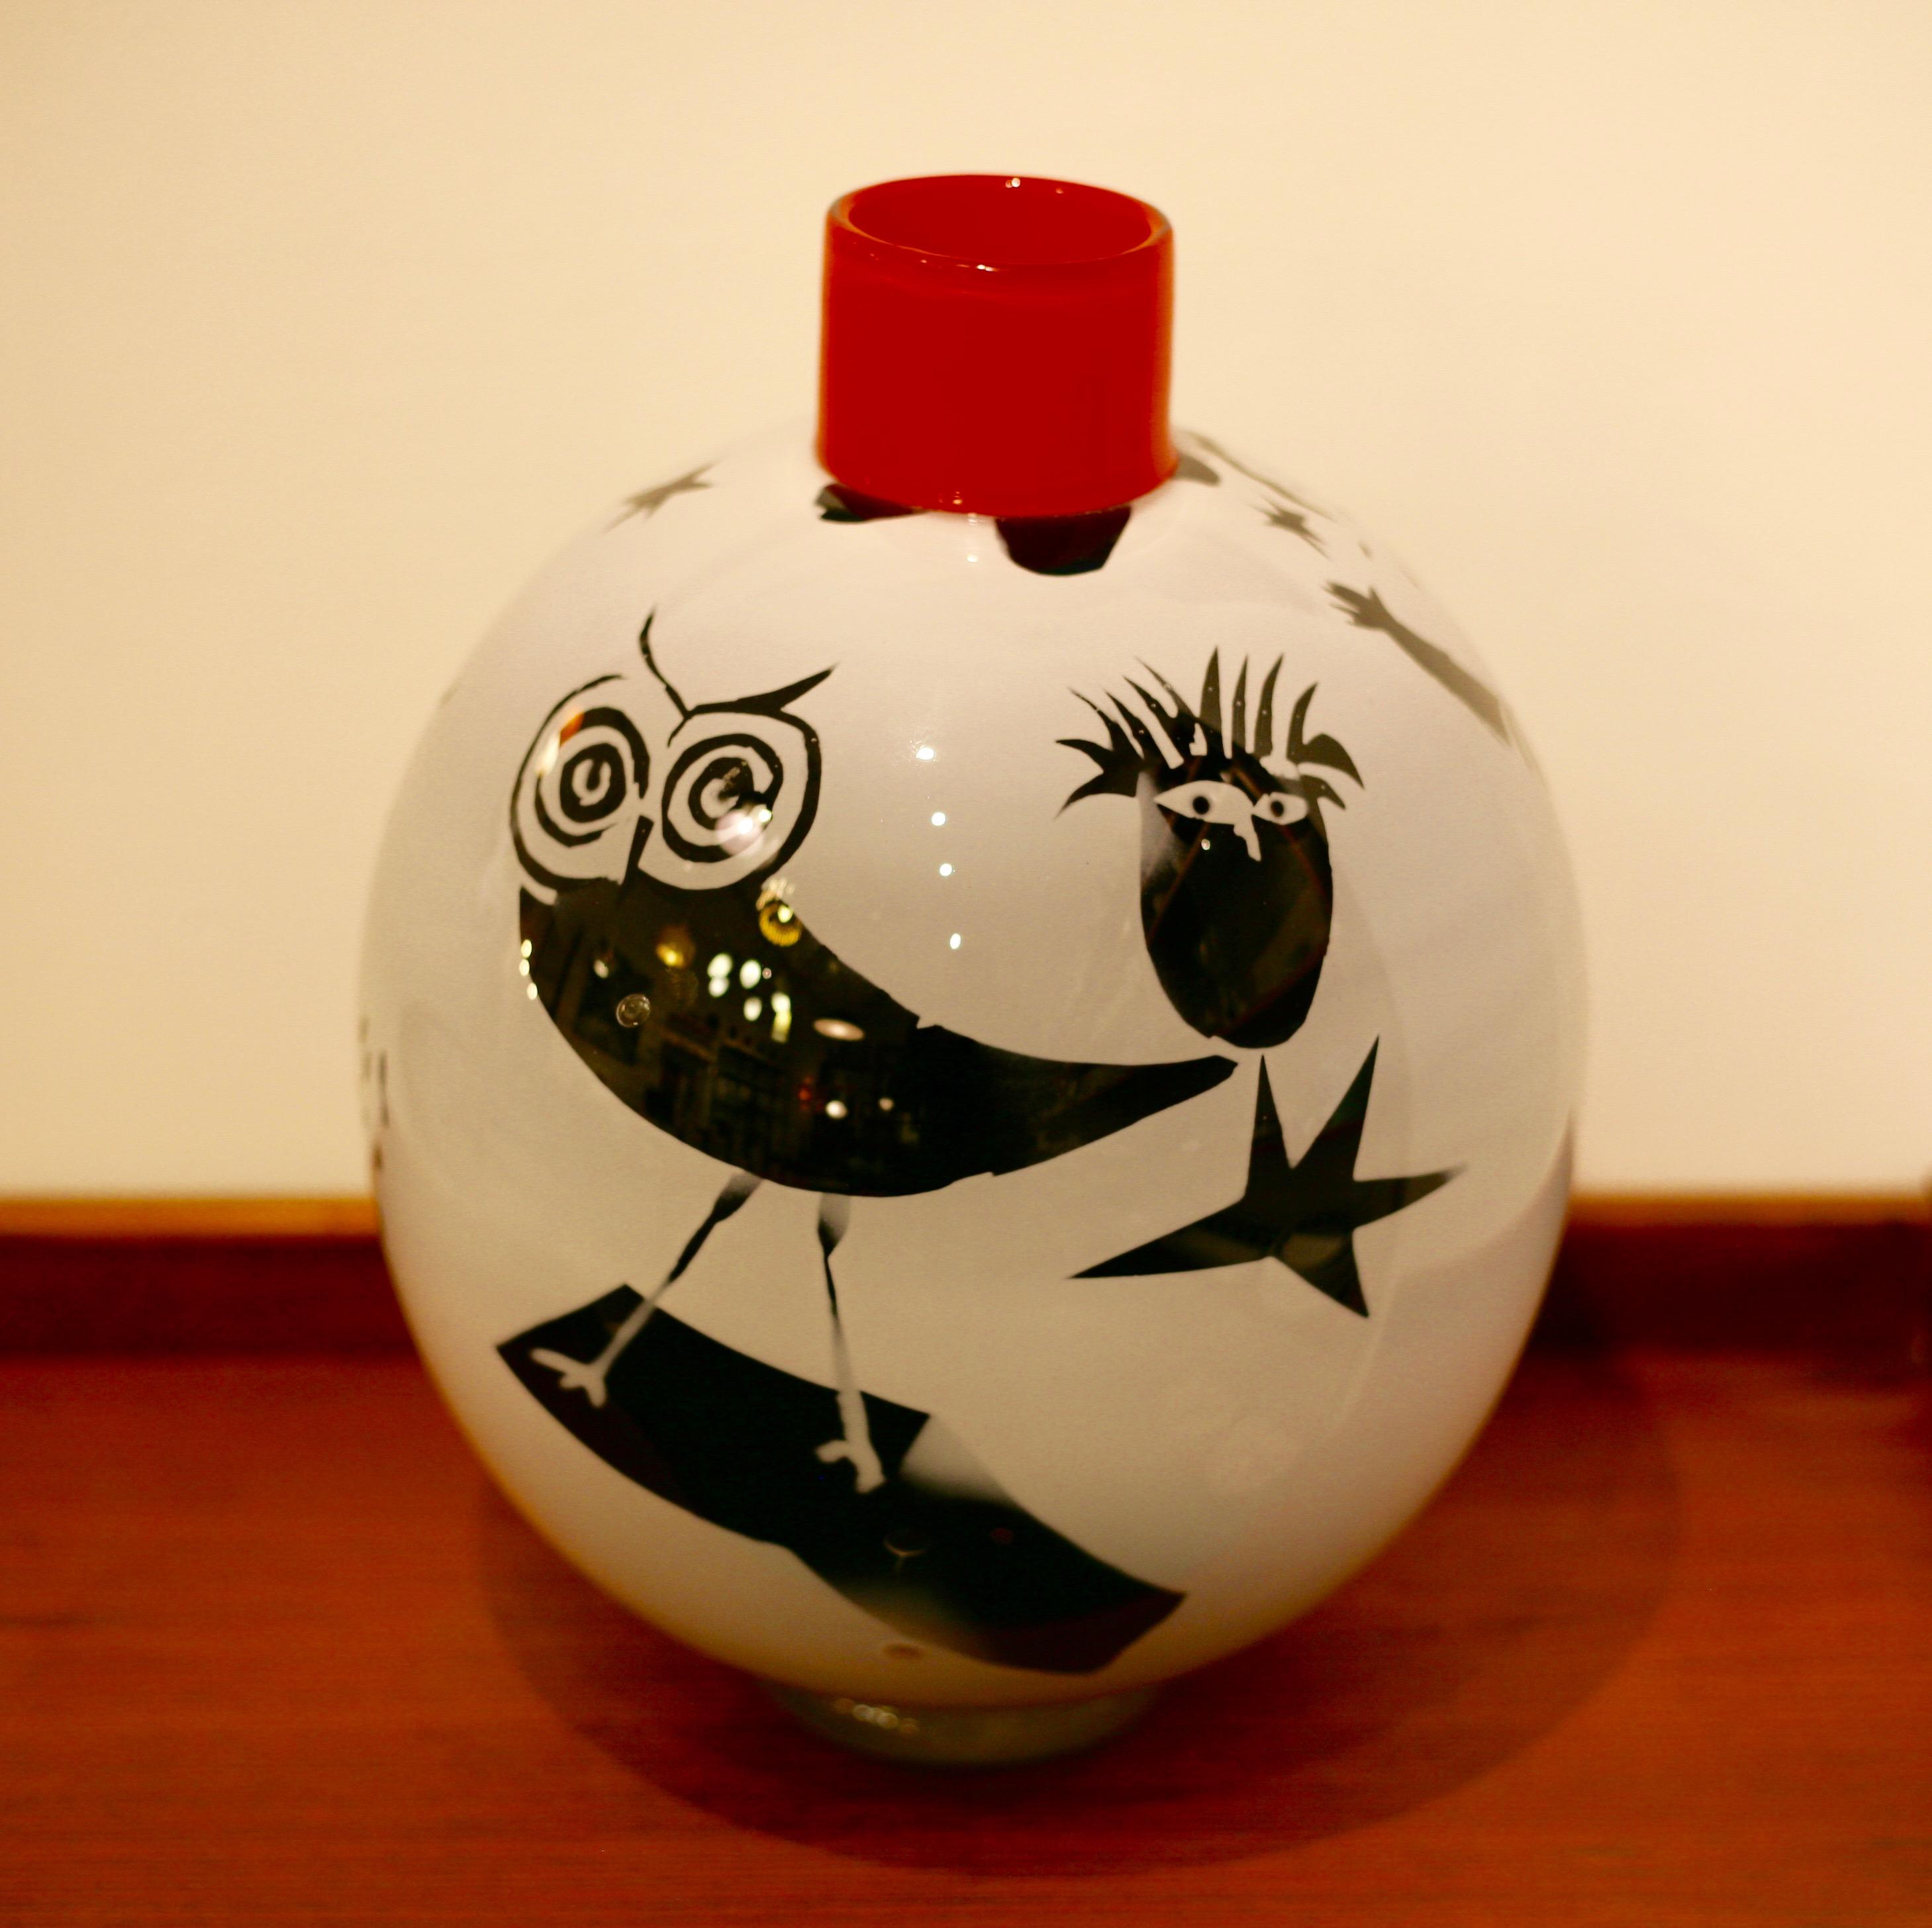 Rolf Sinnemark - The Owl, Graal vase